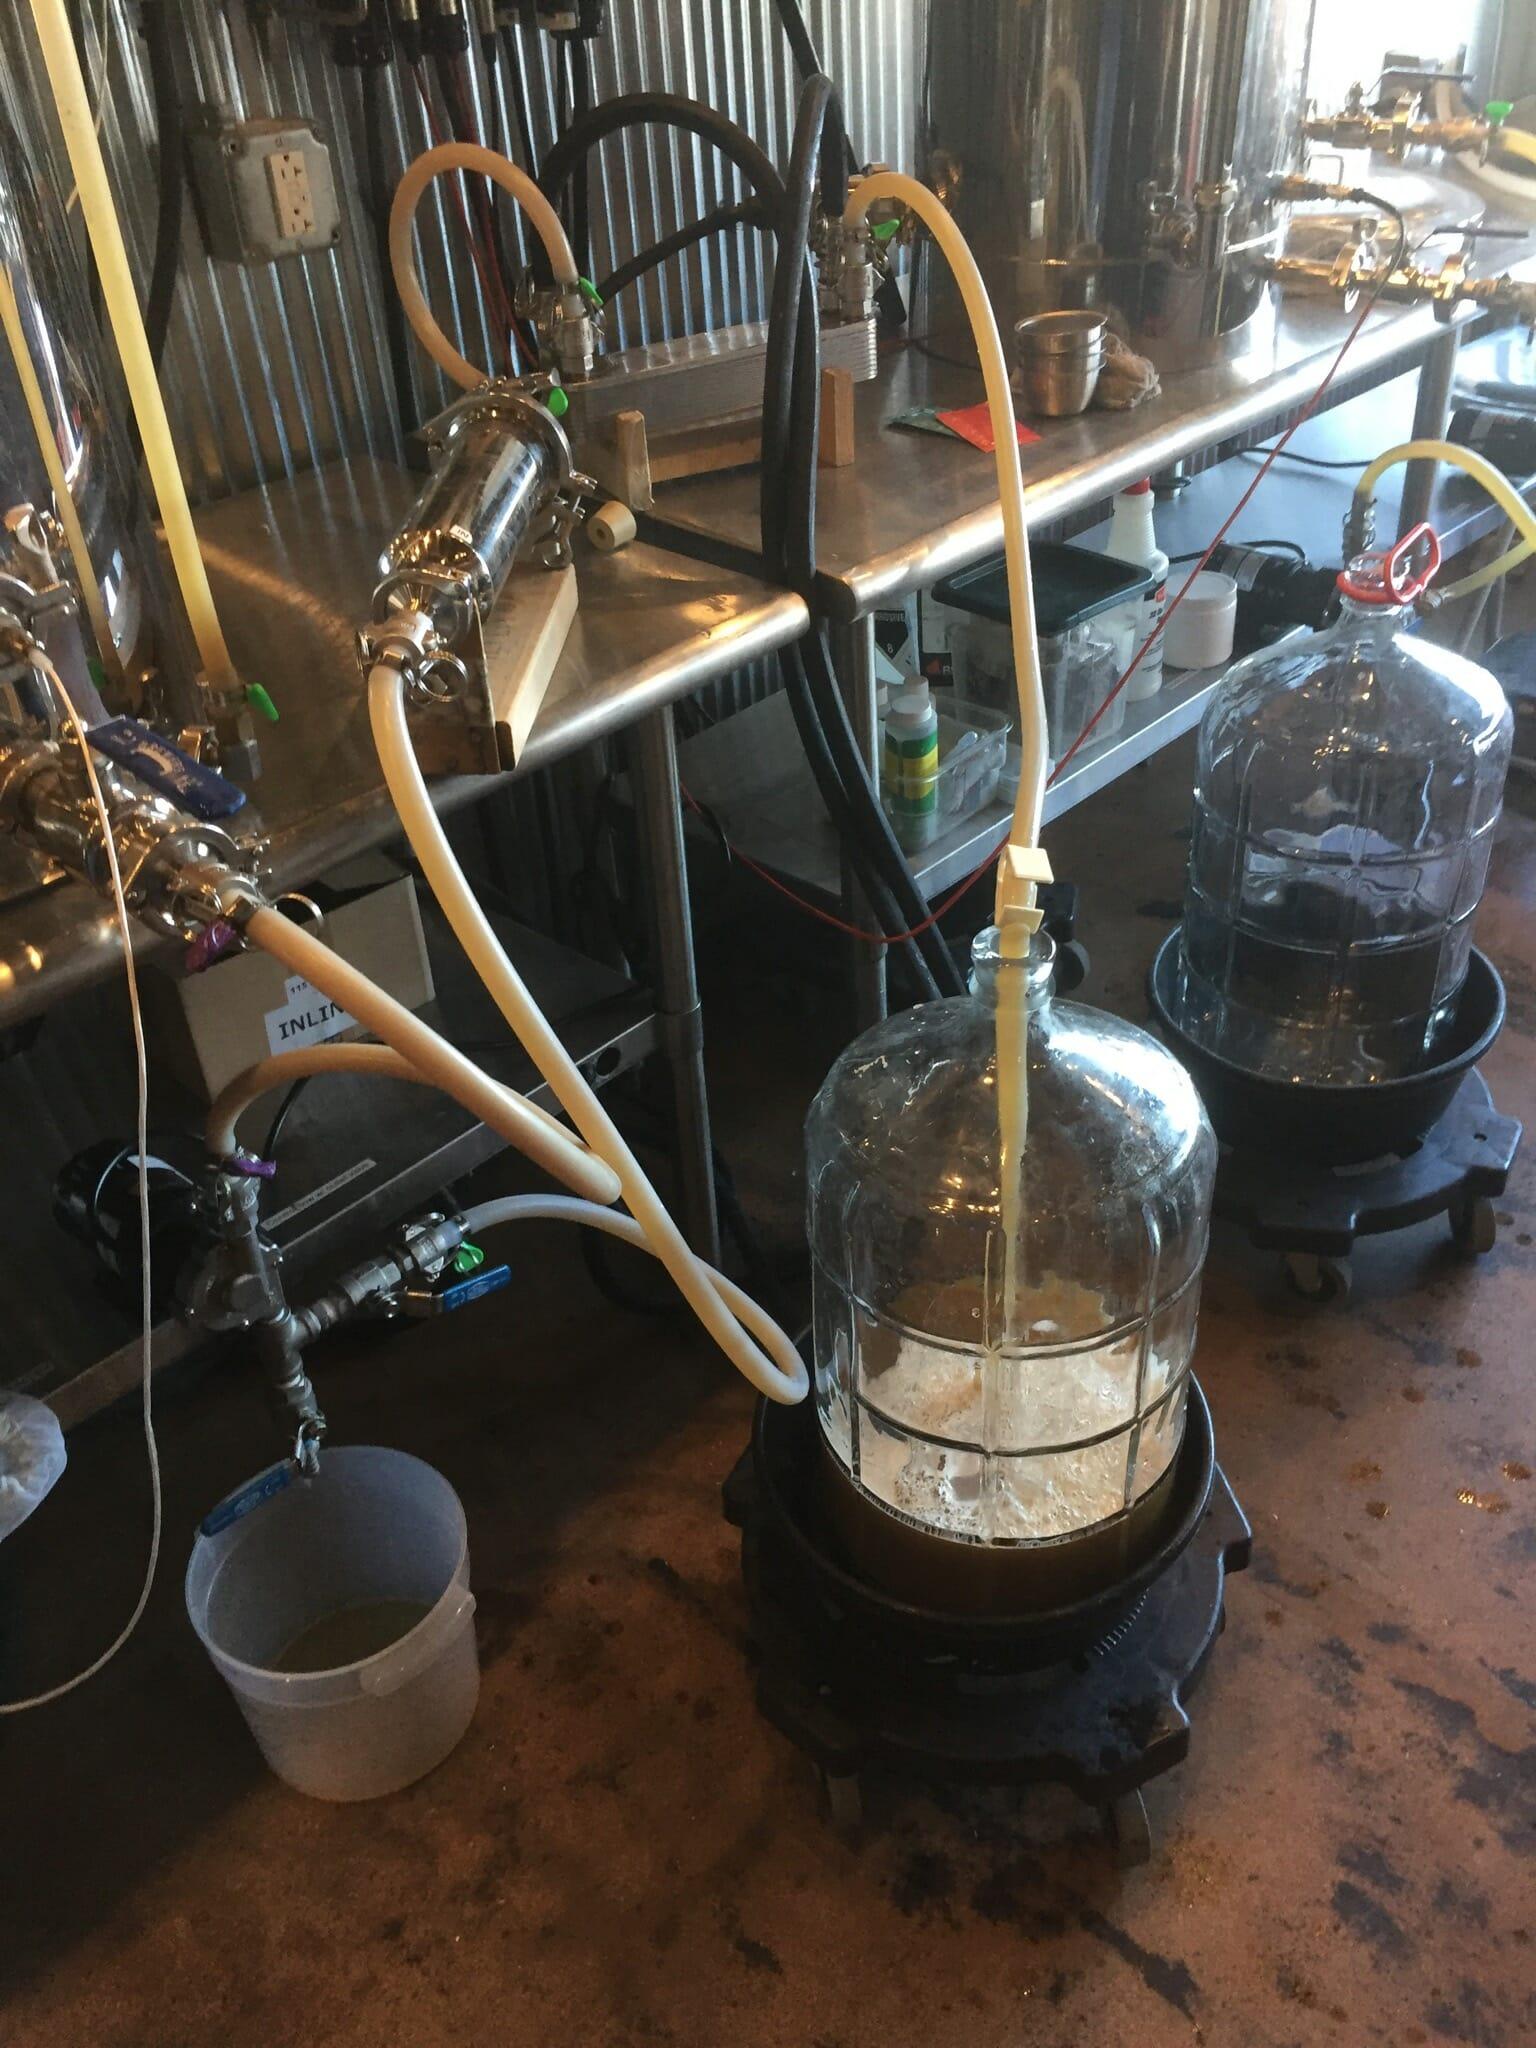 Beer ferment